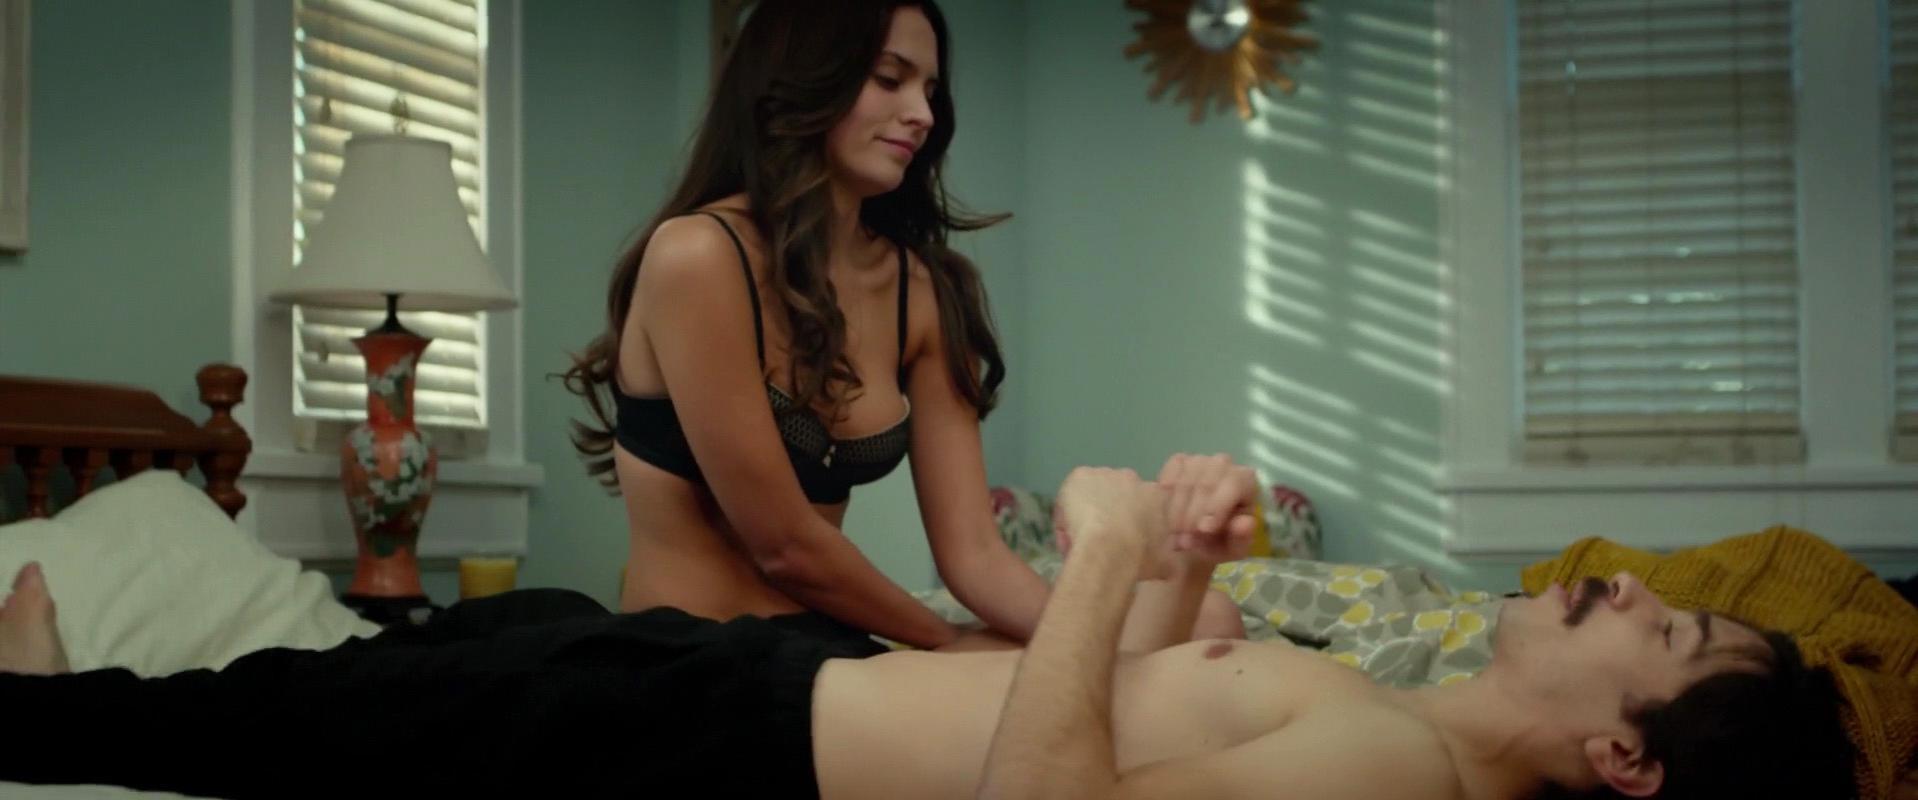 Genesis Rodriguez sexy - Tusk (2014)